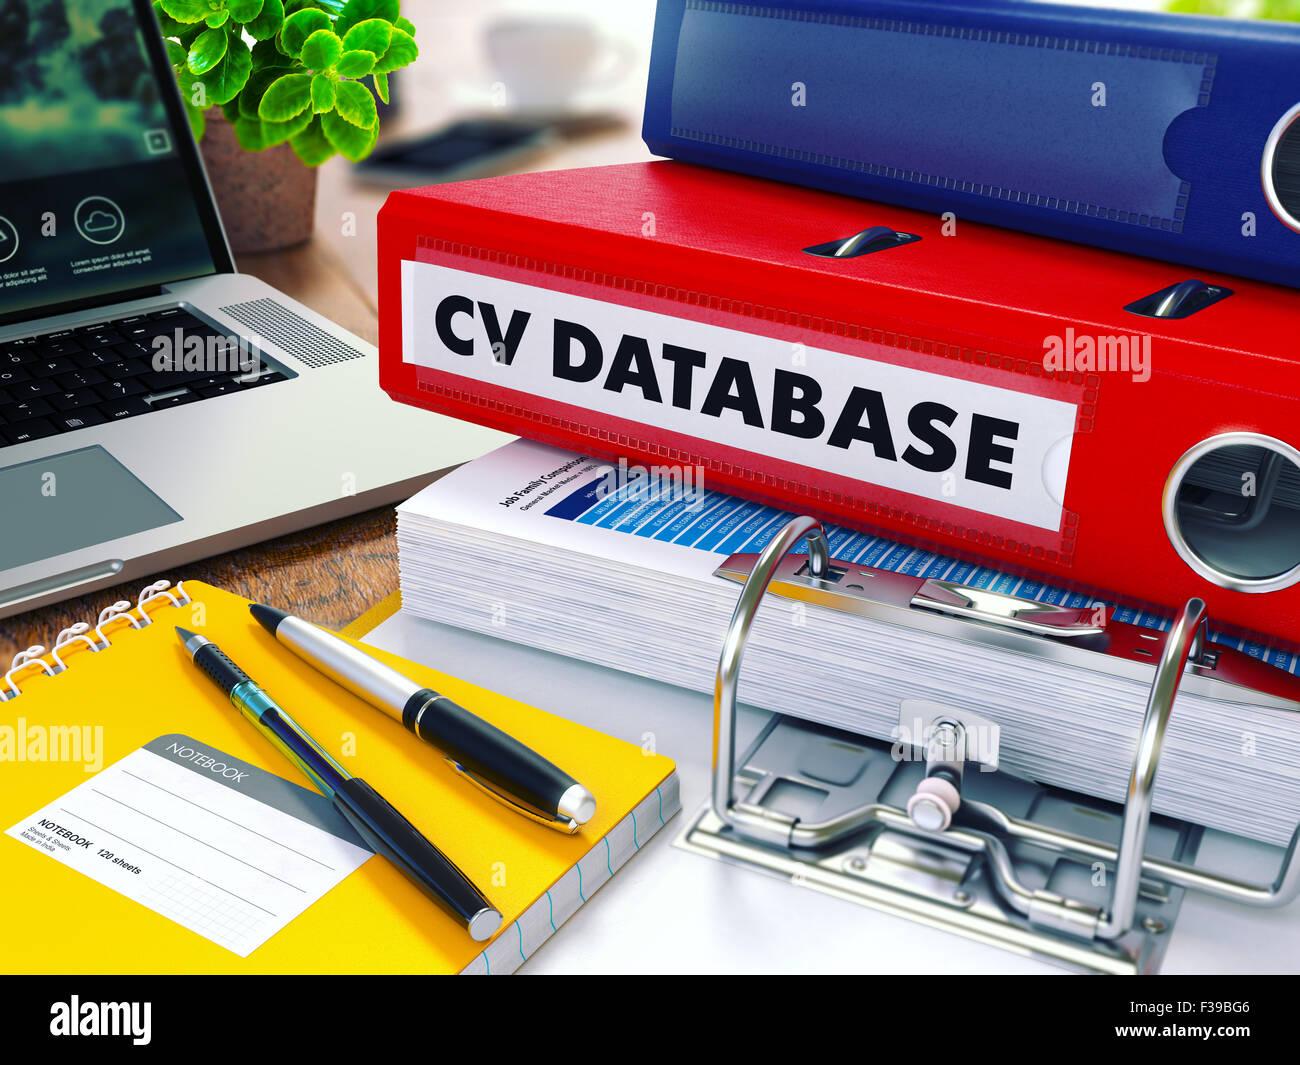 cv database CV Database   Red Ring Binder on Office Desktop with Office